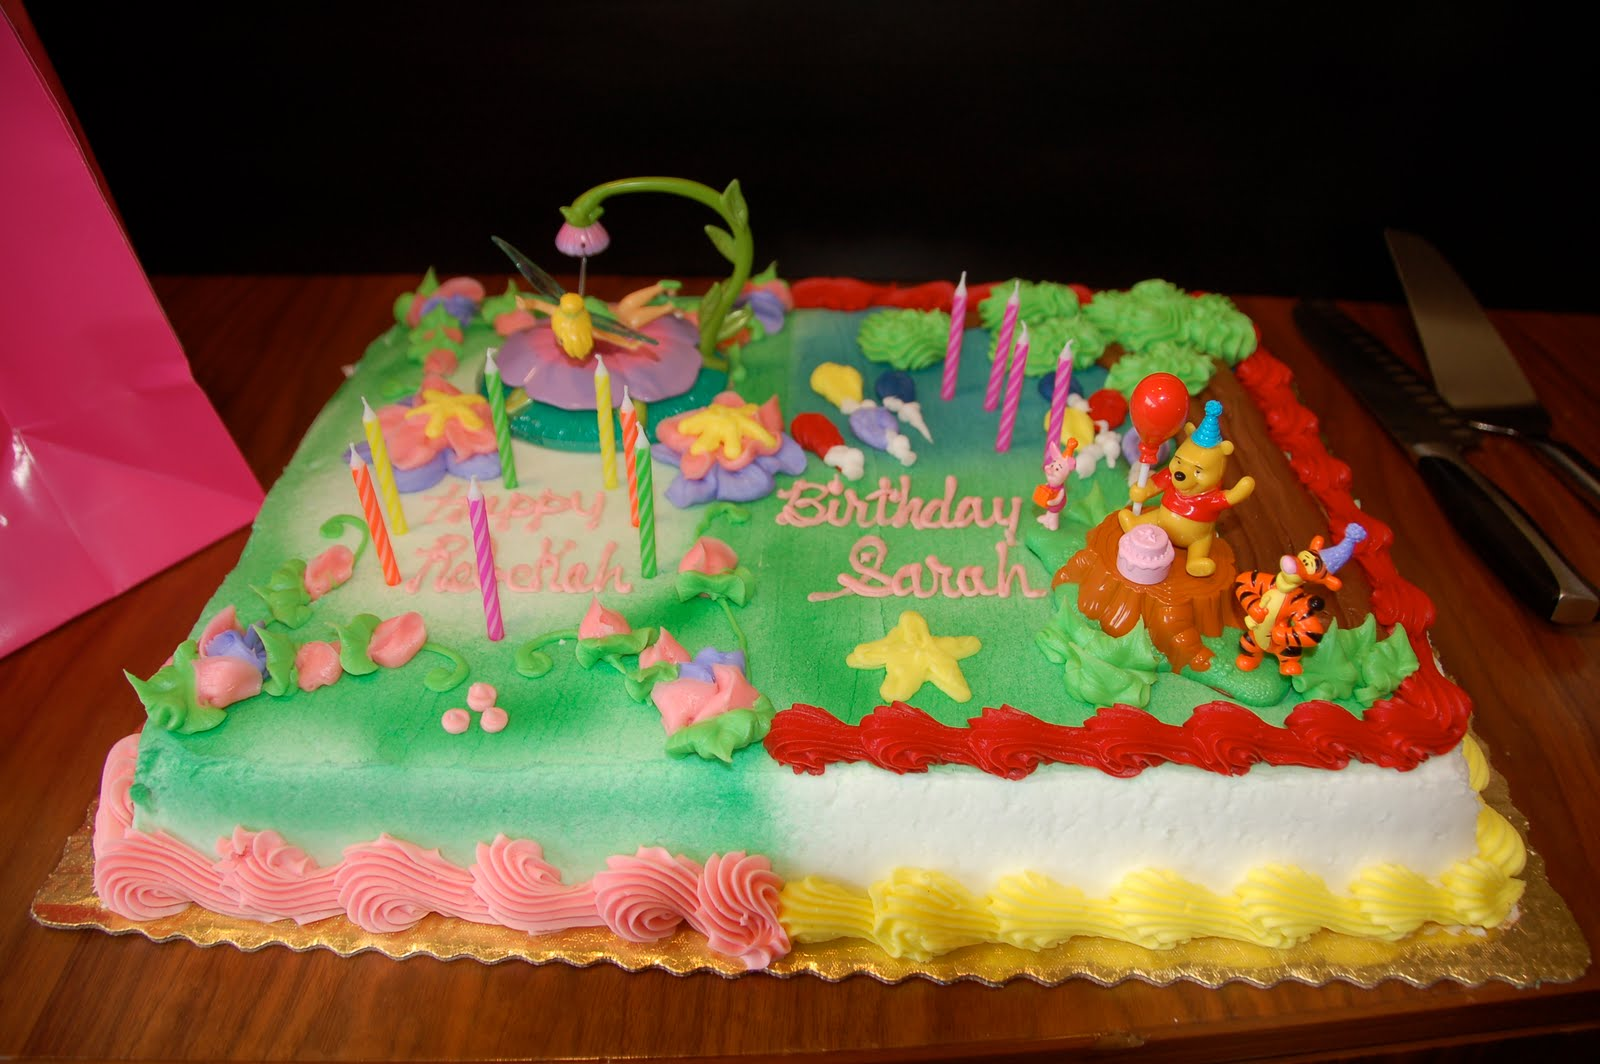 Swell 5 Big Y Sheet Cakes Photo Big Birthday Cake Happy Birthday Cake Funny Birthday Cards Online Inifodamsfinfo